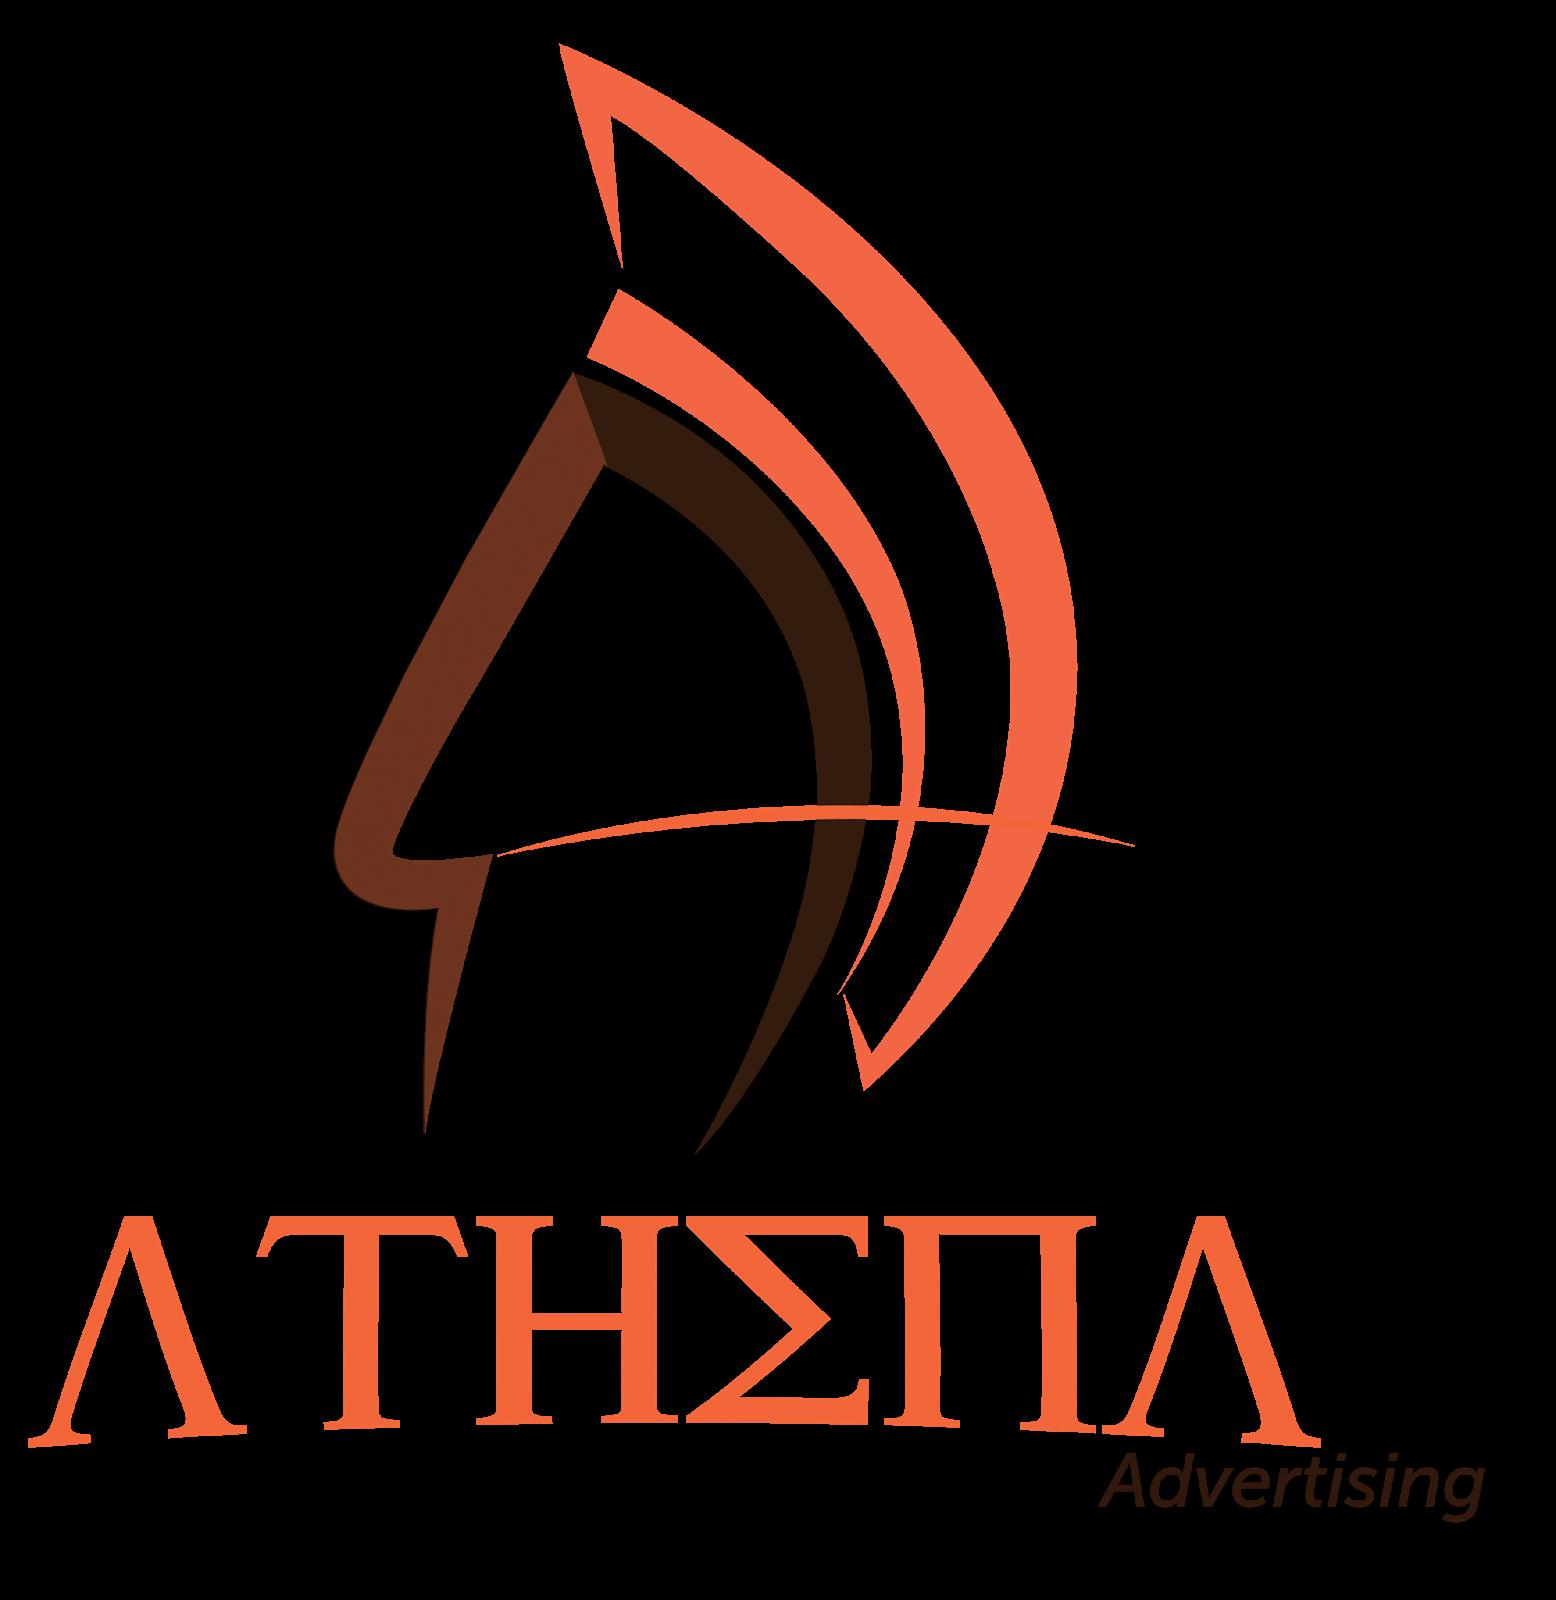 Lowongan Kerja SPG SPB di CV Athena_Org.Ltd Advertising – Yogyakarta (Fee 800 Ribu – 1 Juta/minggu + bonus)